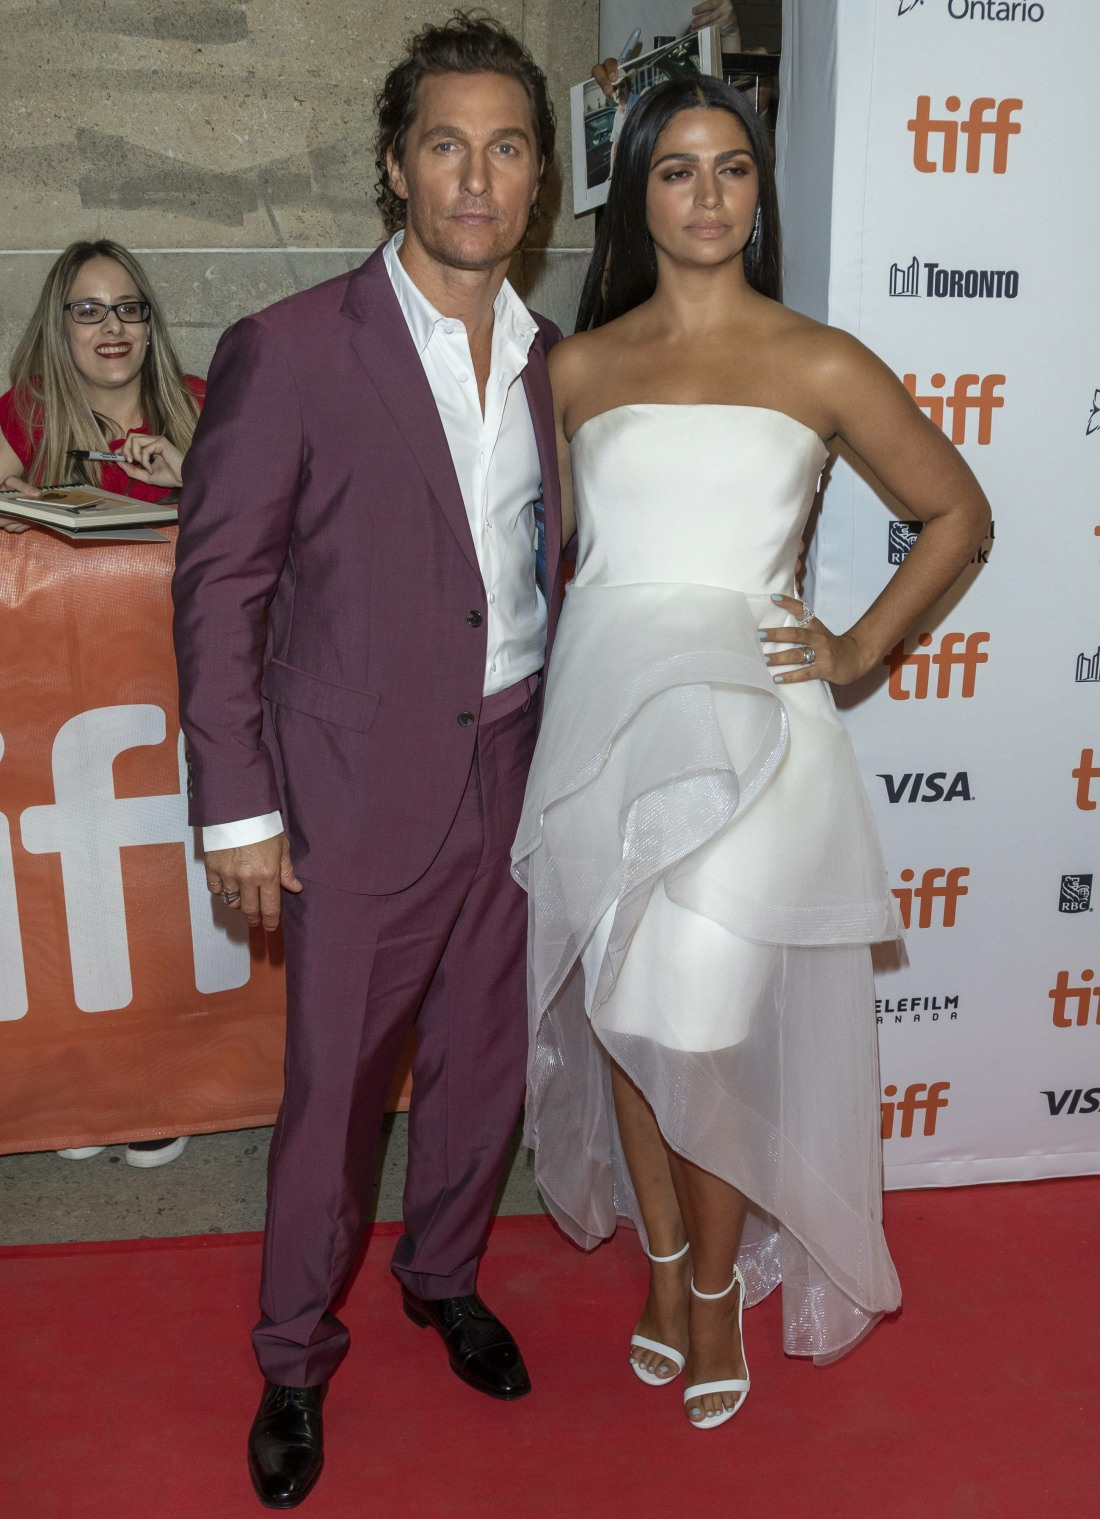 43rd Toronto International Film Festival